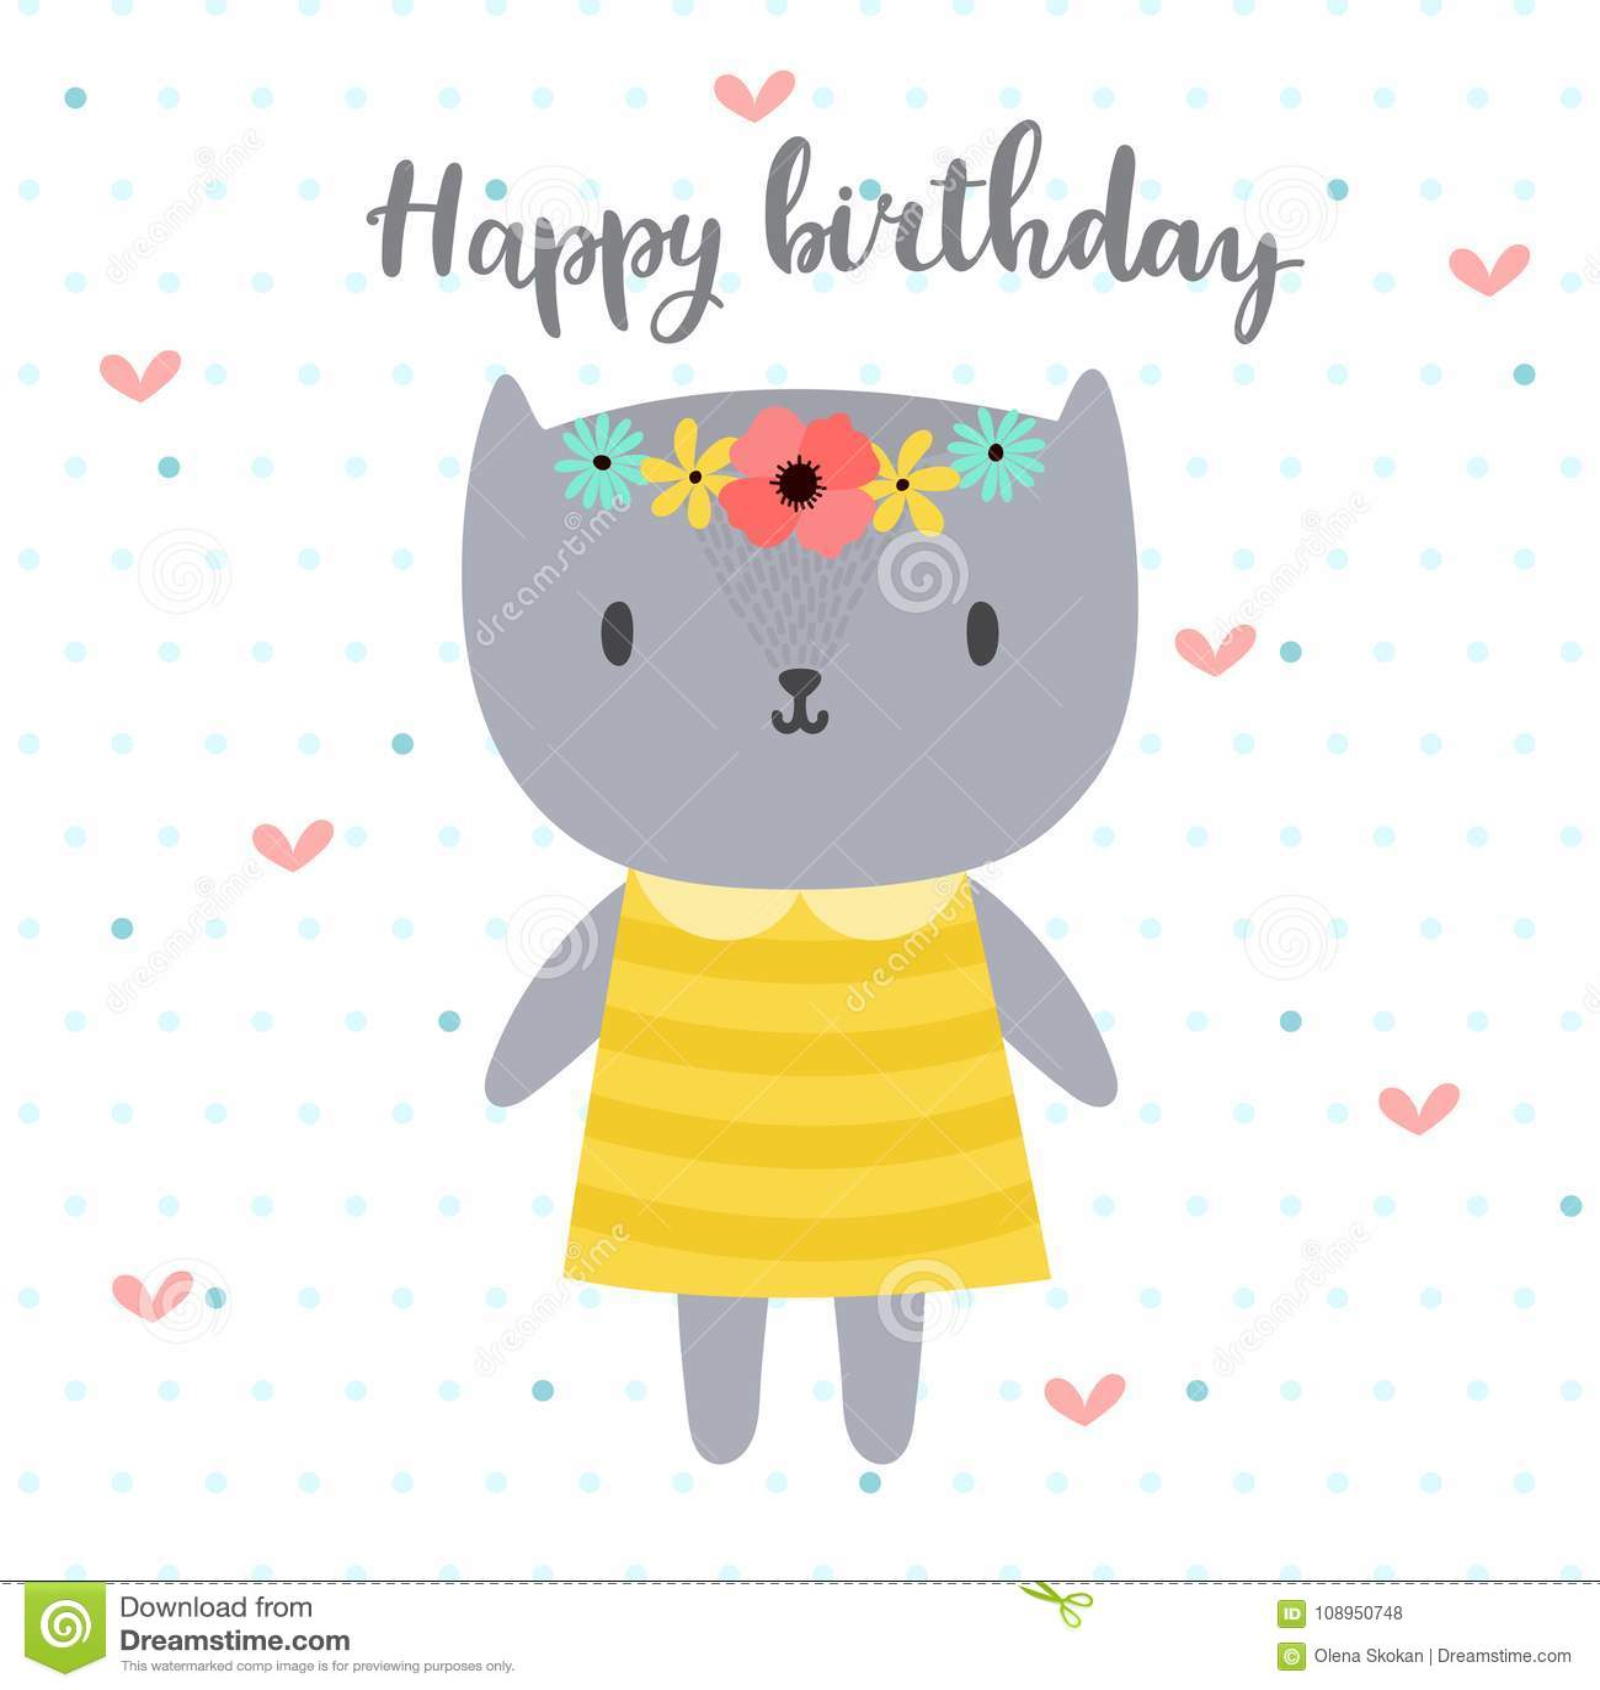 Gelukkige Verjaardag Leuke Groetkaart Met Grappig Weinig Kat Vector